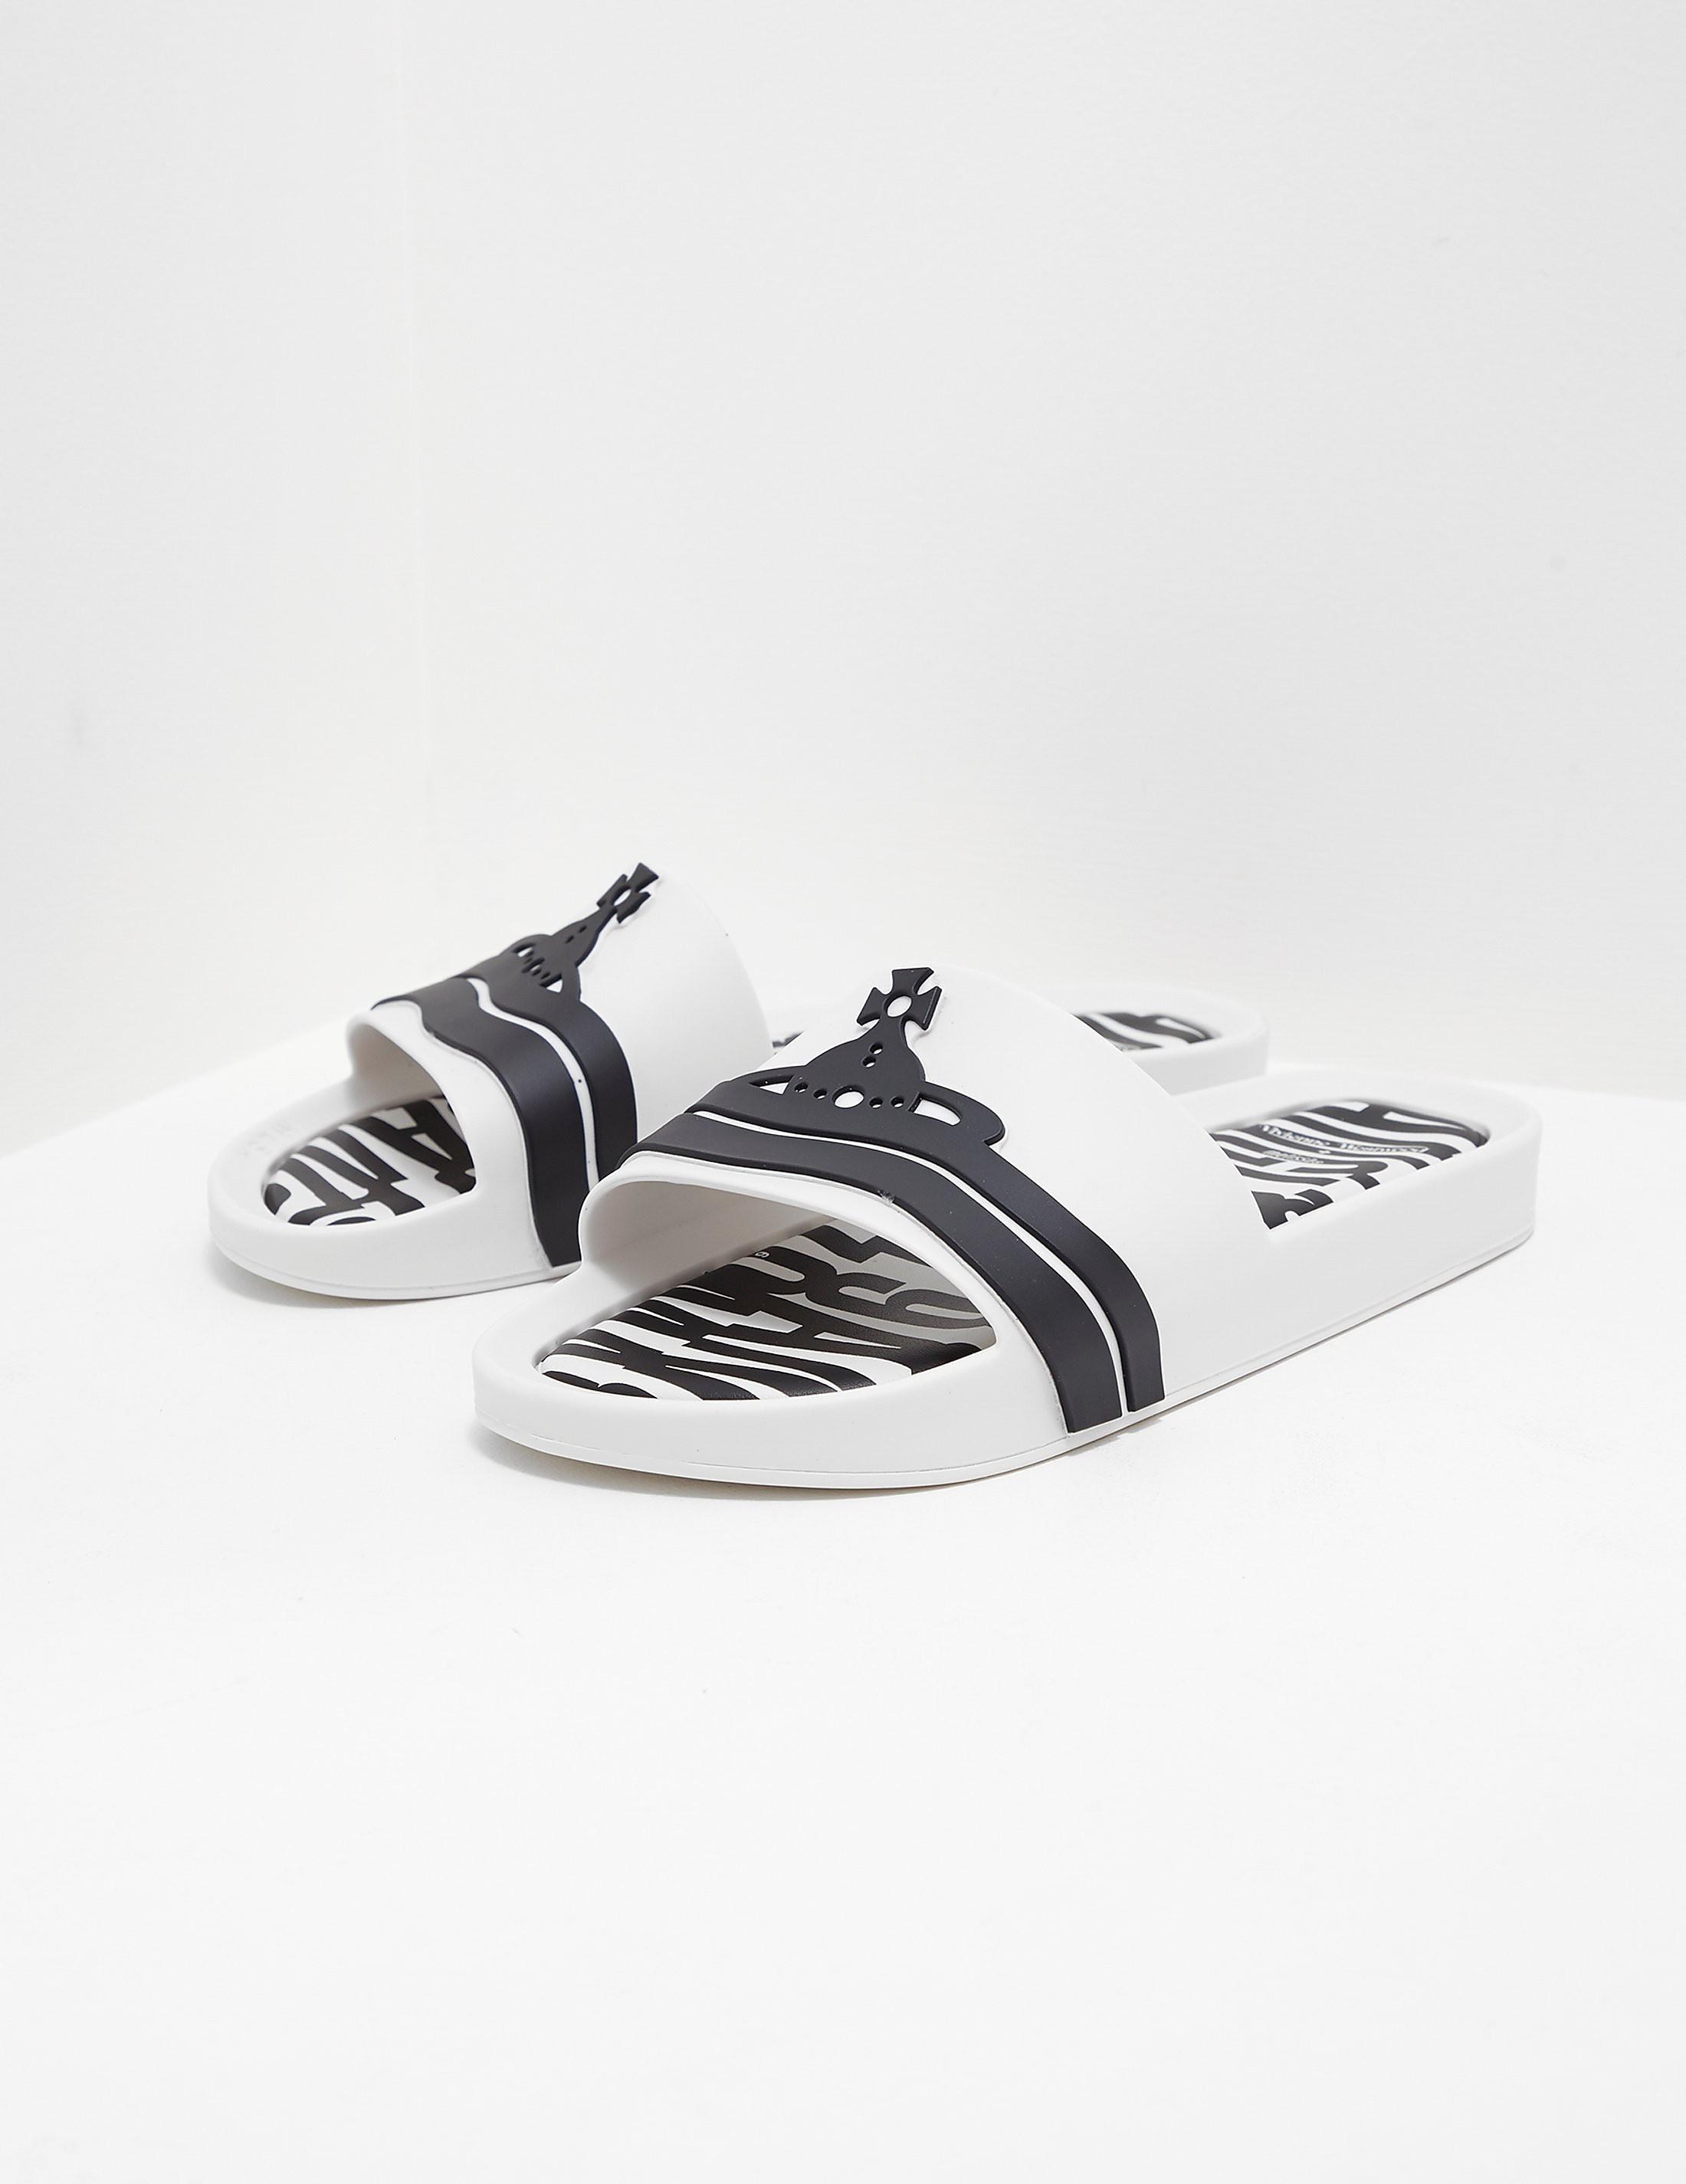 Melissa x Vivienne Westwood Anglomania Beach Slides